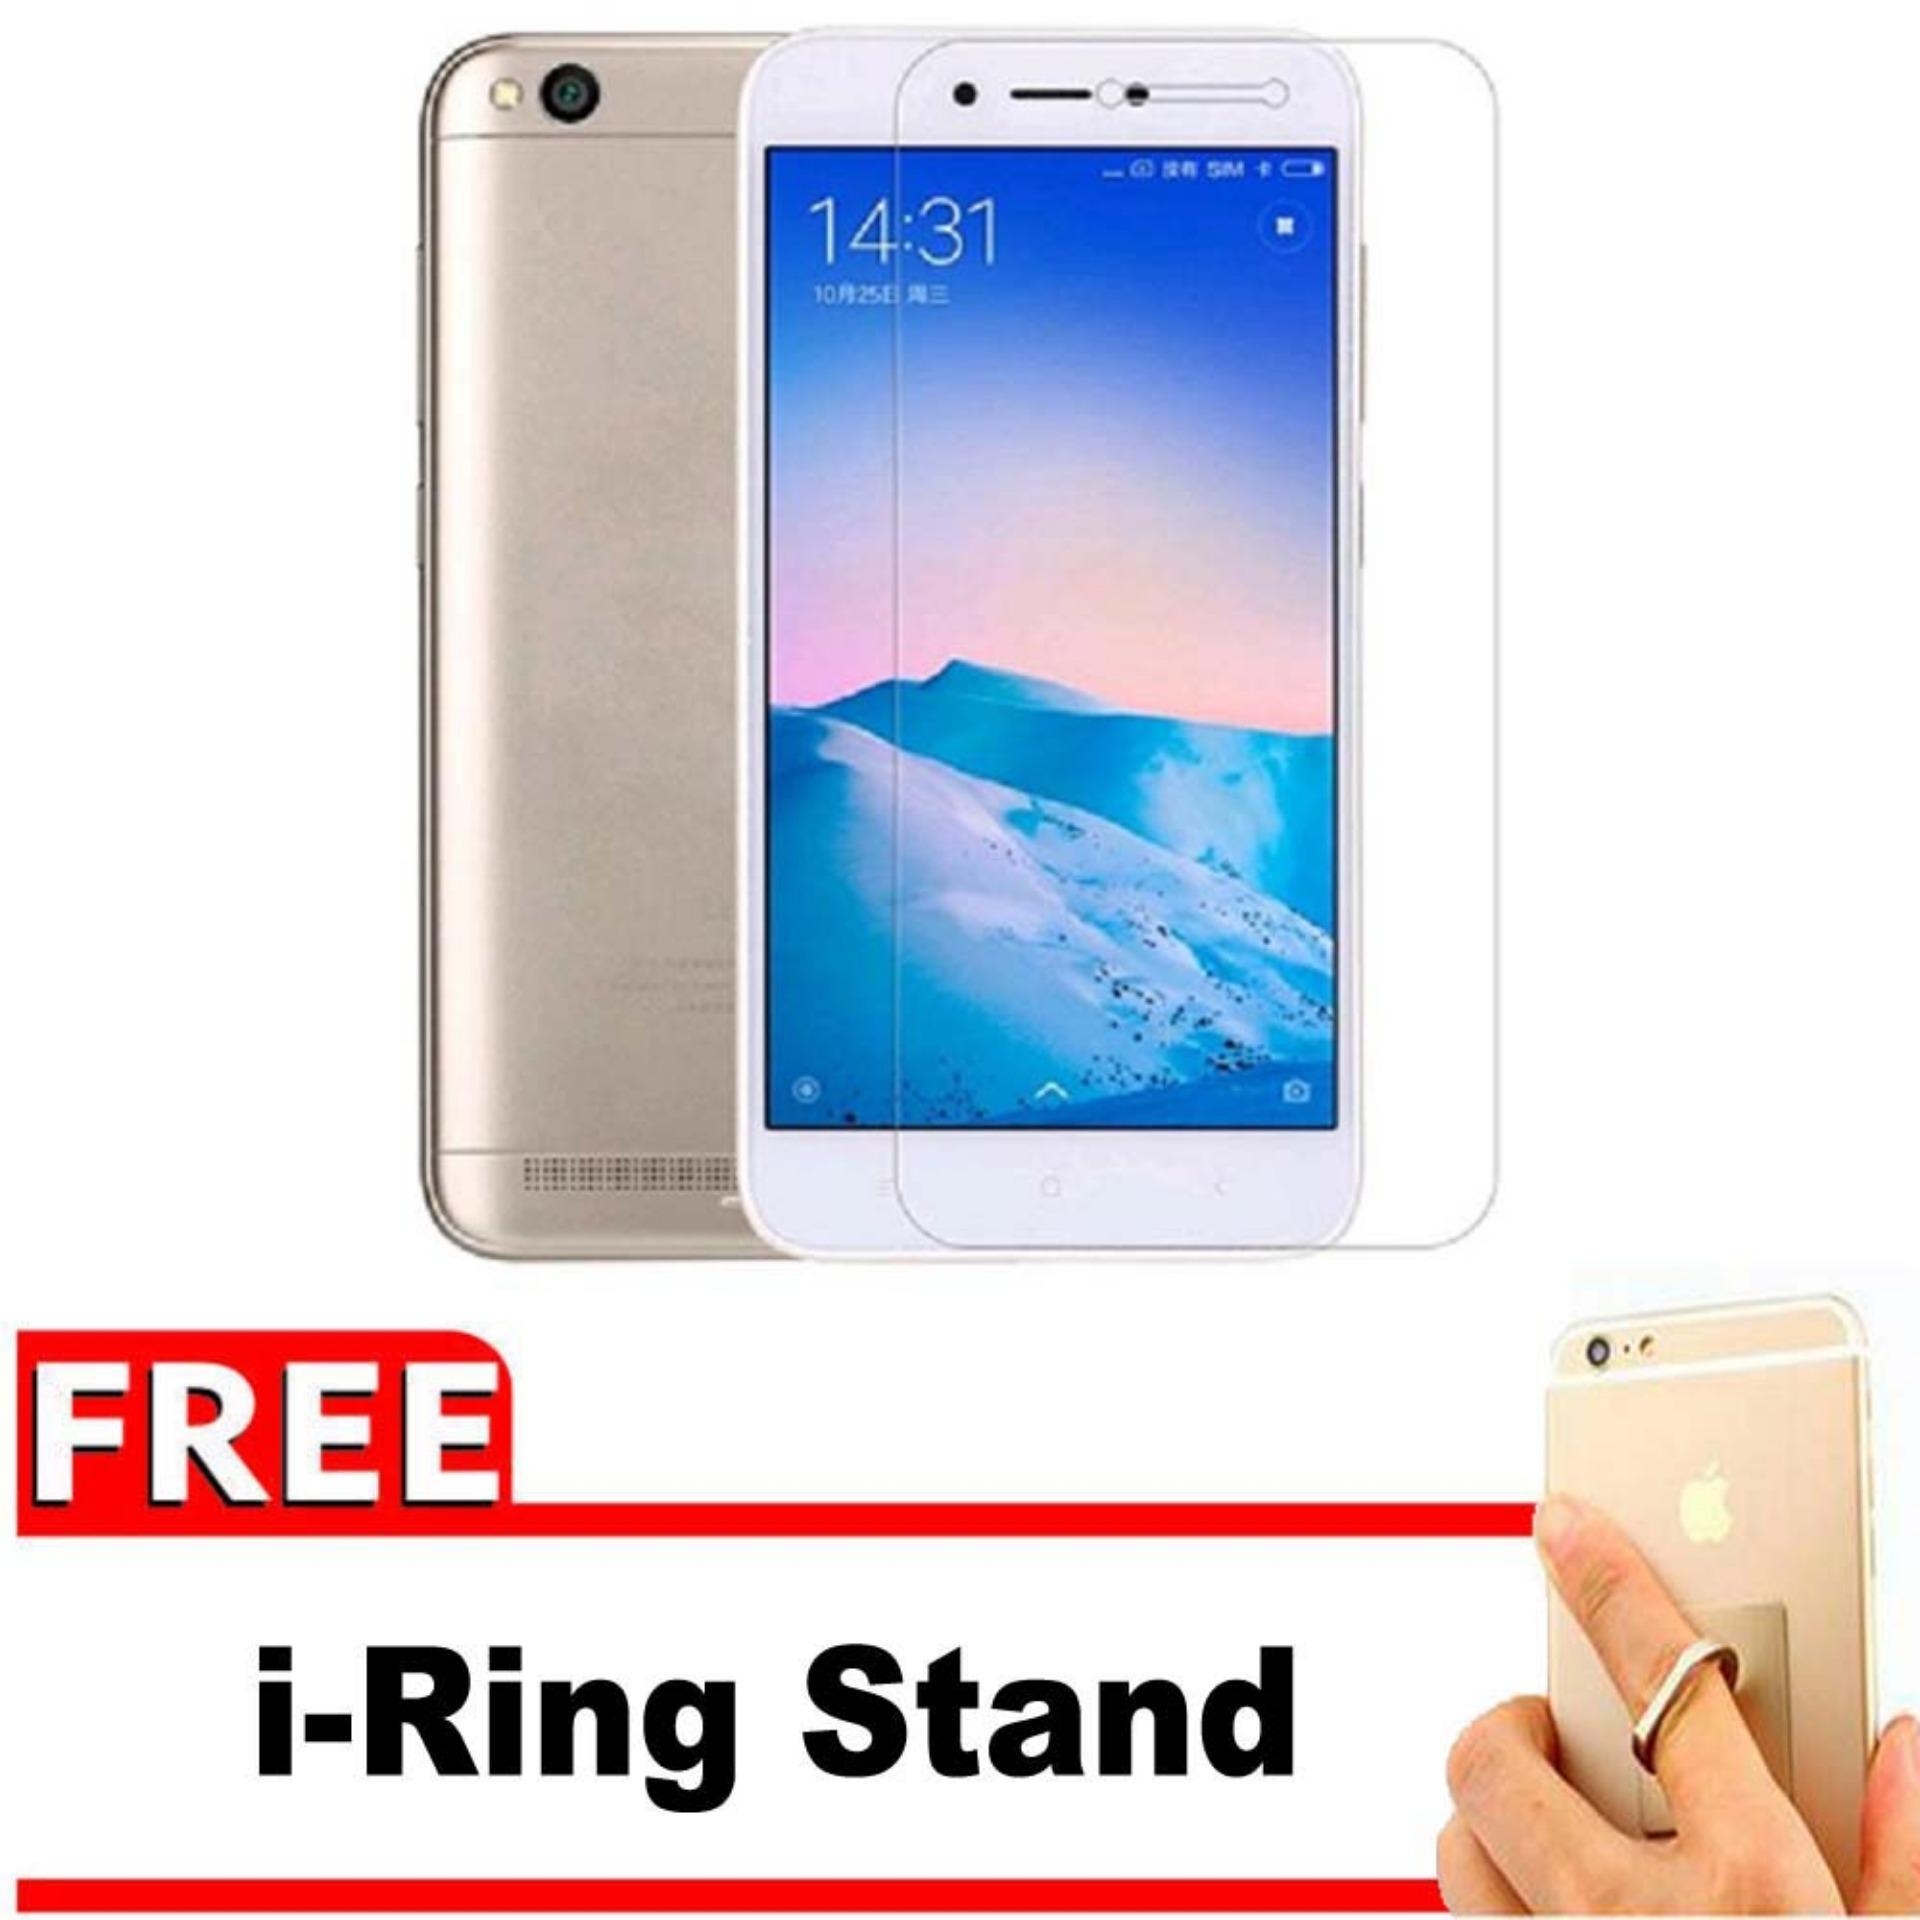 Vn Xiaomi Xioami Xiomi Redmi 5A Prime 5 Snapdragon Mediatek TAM Resmi Distributor Tempered Glass 9H Screen Protector 032mm Gratis Free IRing Stand